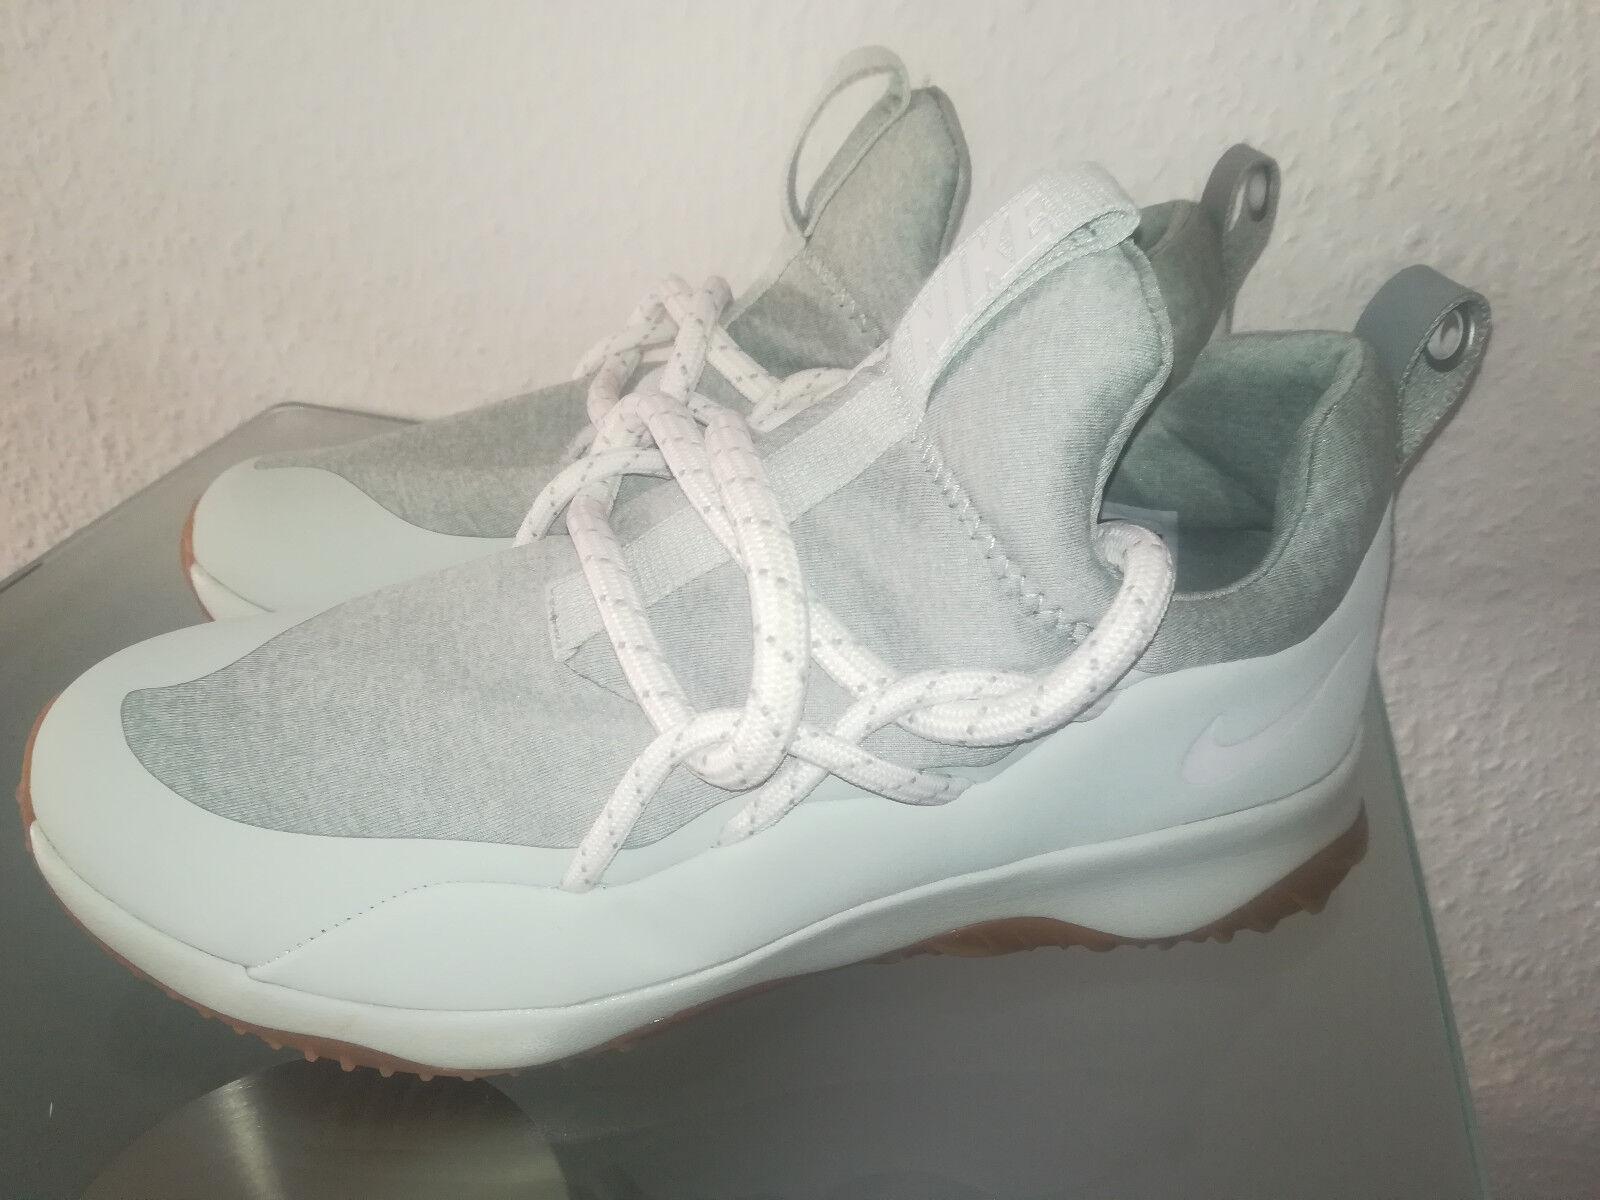 Nike City Loop Light Damen Pumice AA1097-002 Sneakers Damen Light Schuhe Neu Gr.42,5 32ce53